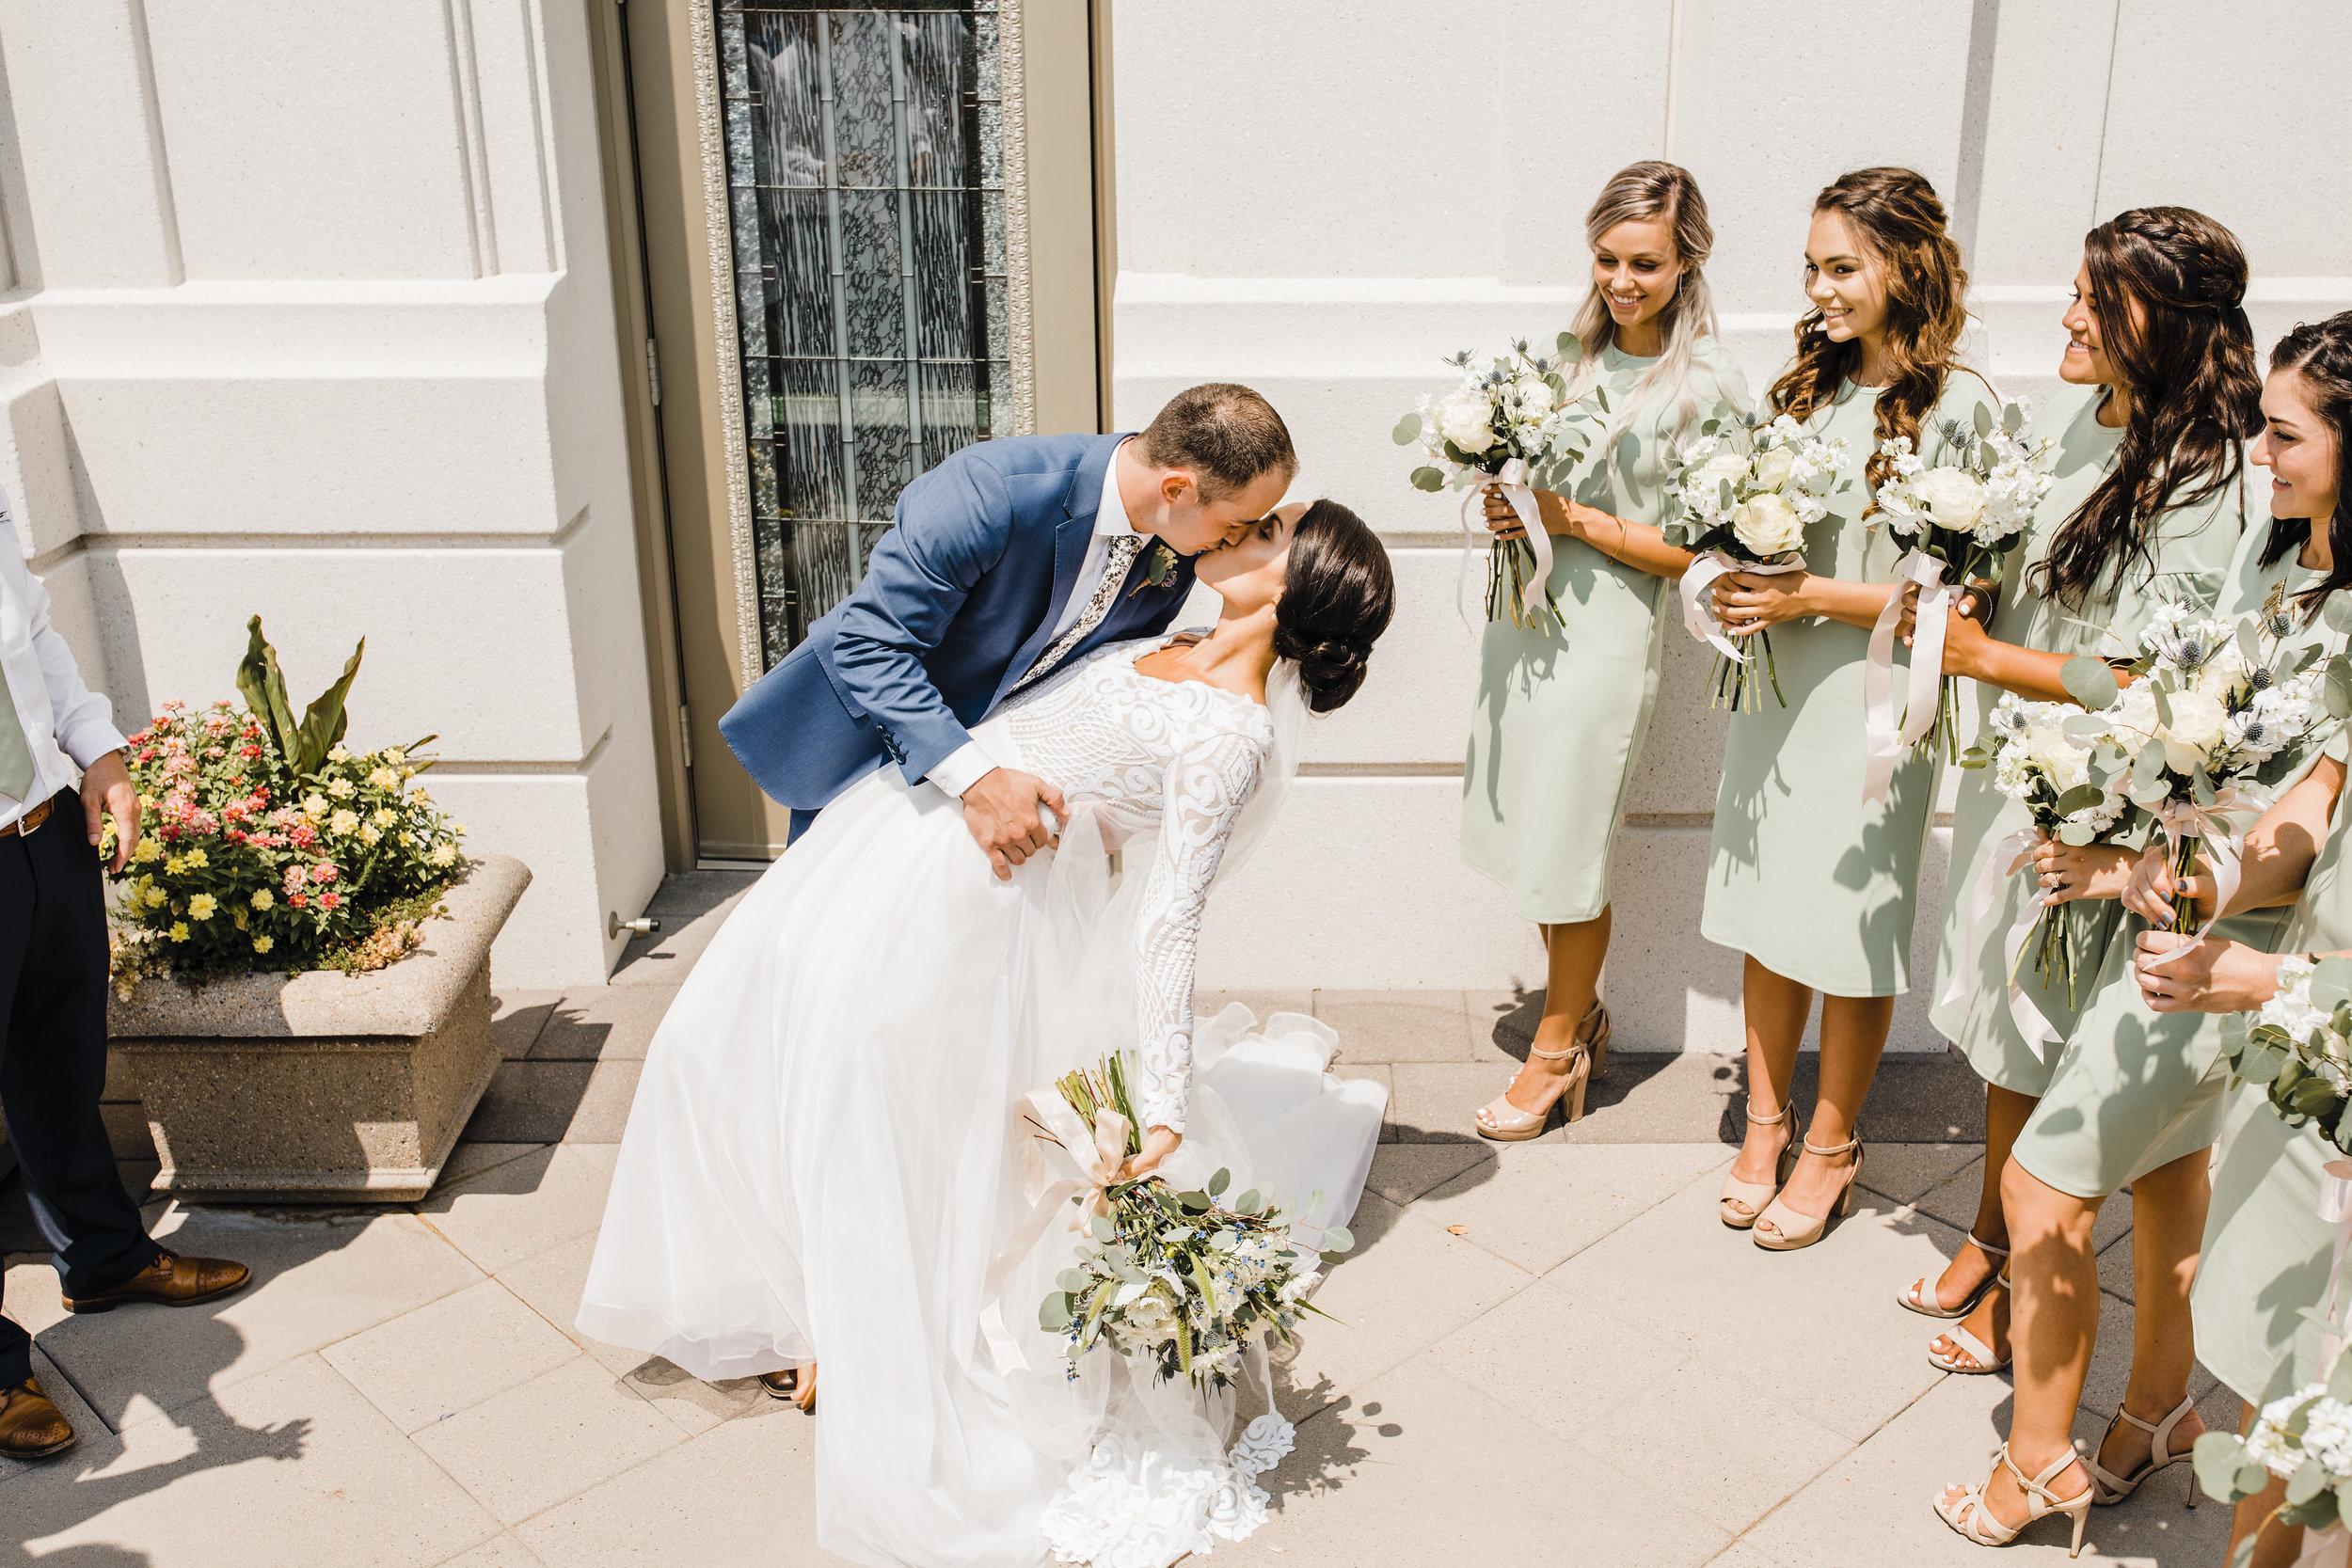 brigham city utah wedding photographer lds temple exit dip kissing cheering happy